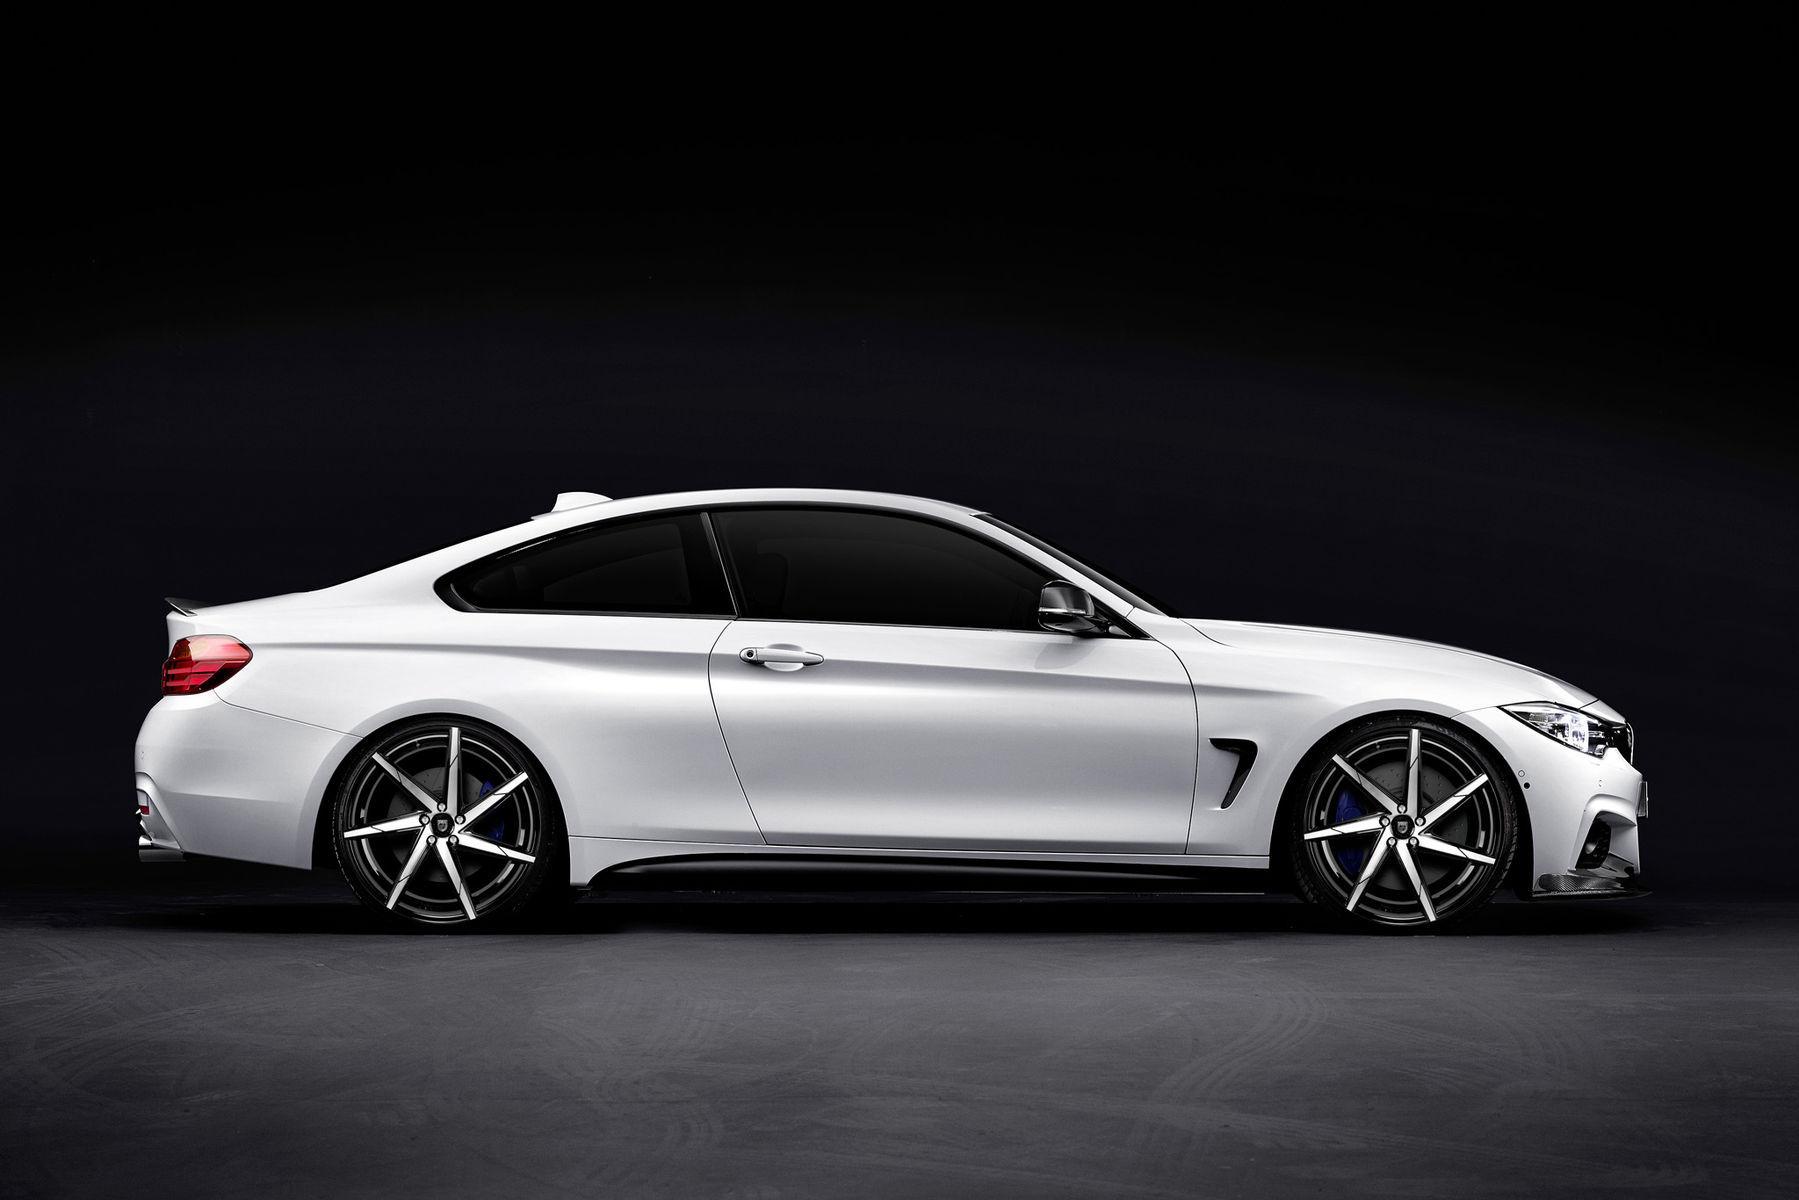 2014 BMW 4 Series | BMW 4-series on Lexani CSS-7s